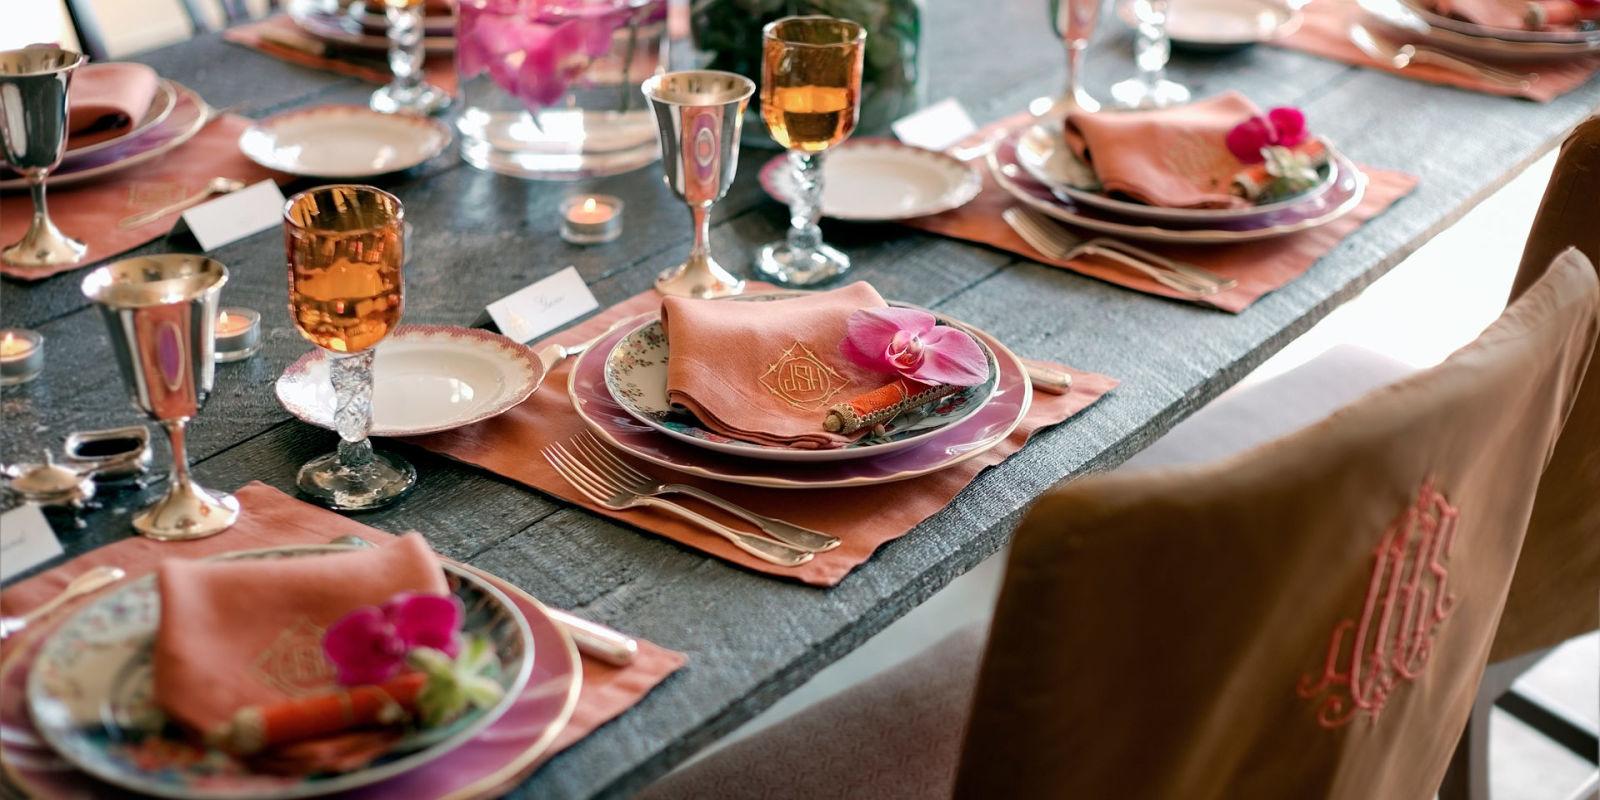 Table Decorations: Ideas For Autumn Tablescape